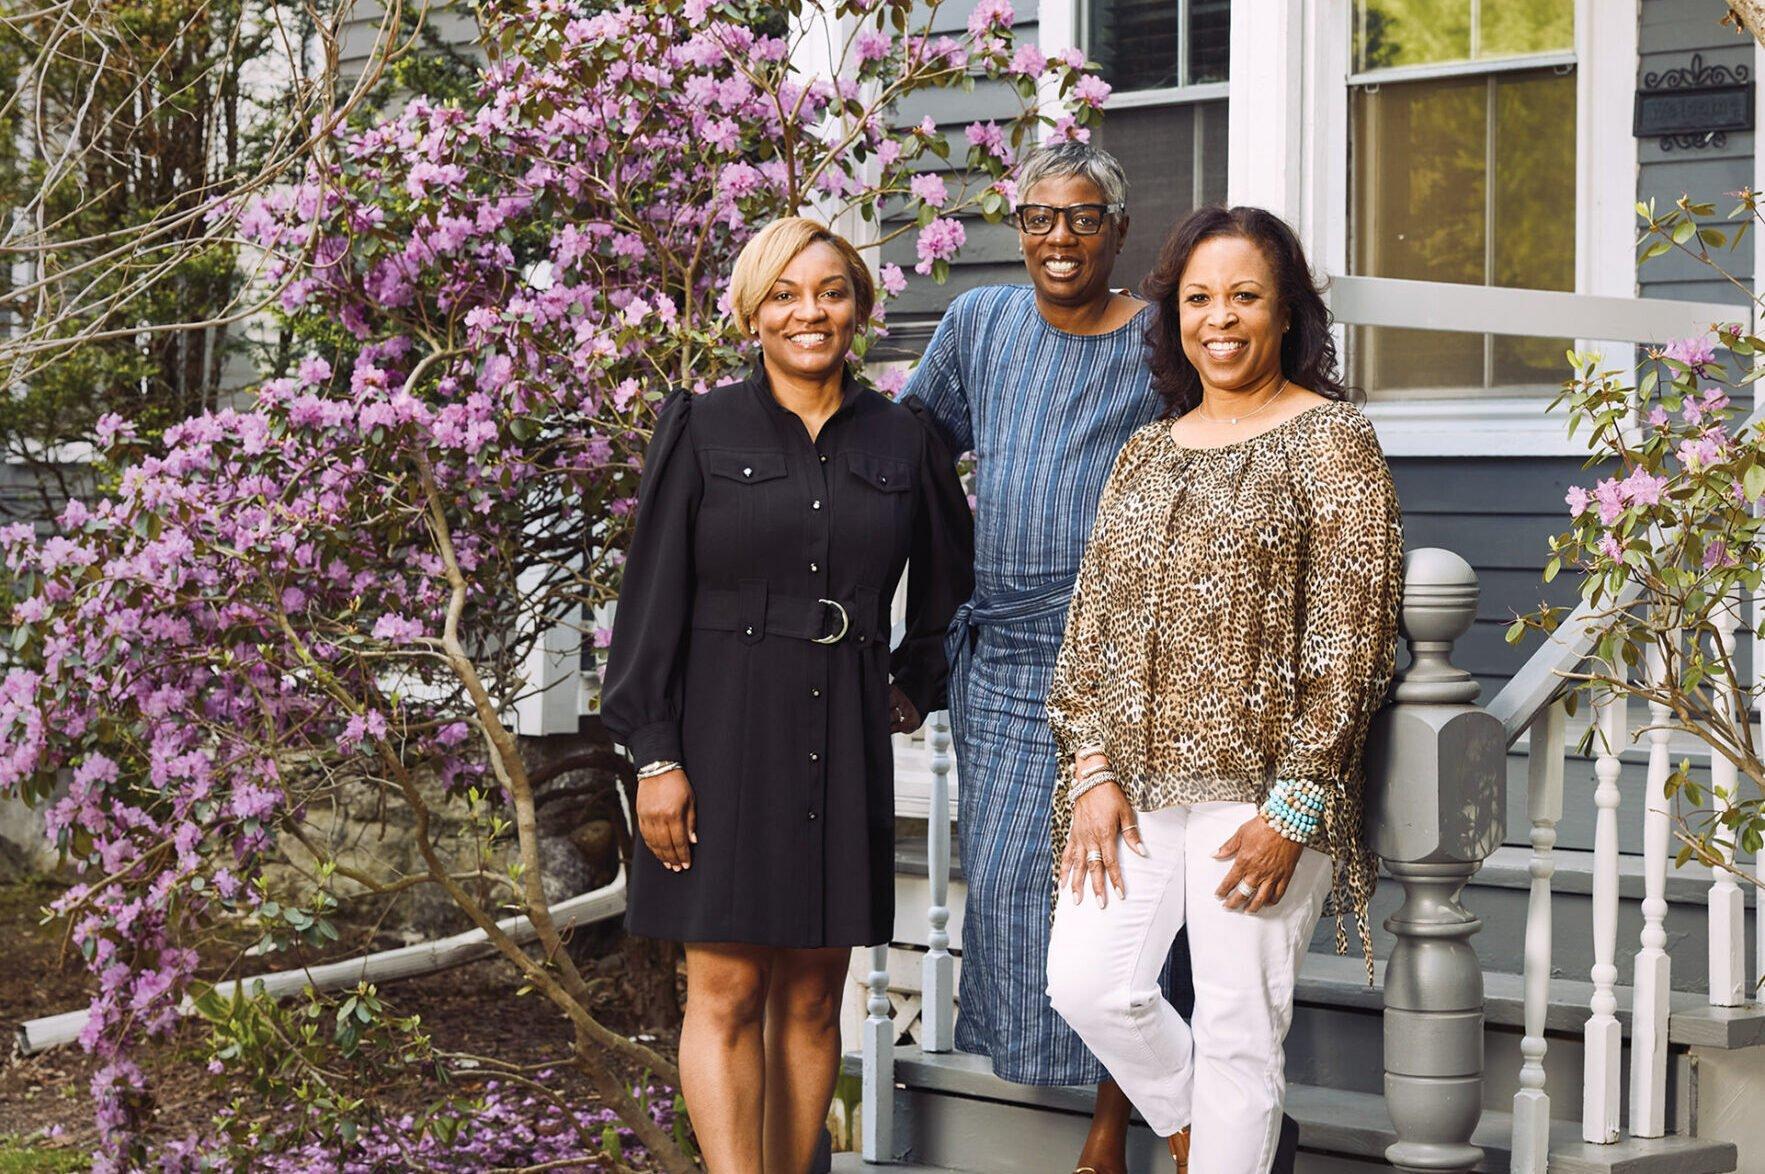 Shawna Underwood, Iantha Carley and Dennese Guadeloupe Rojas